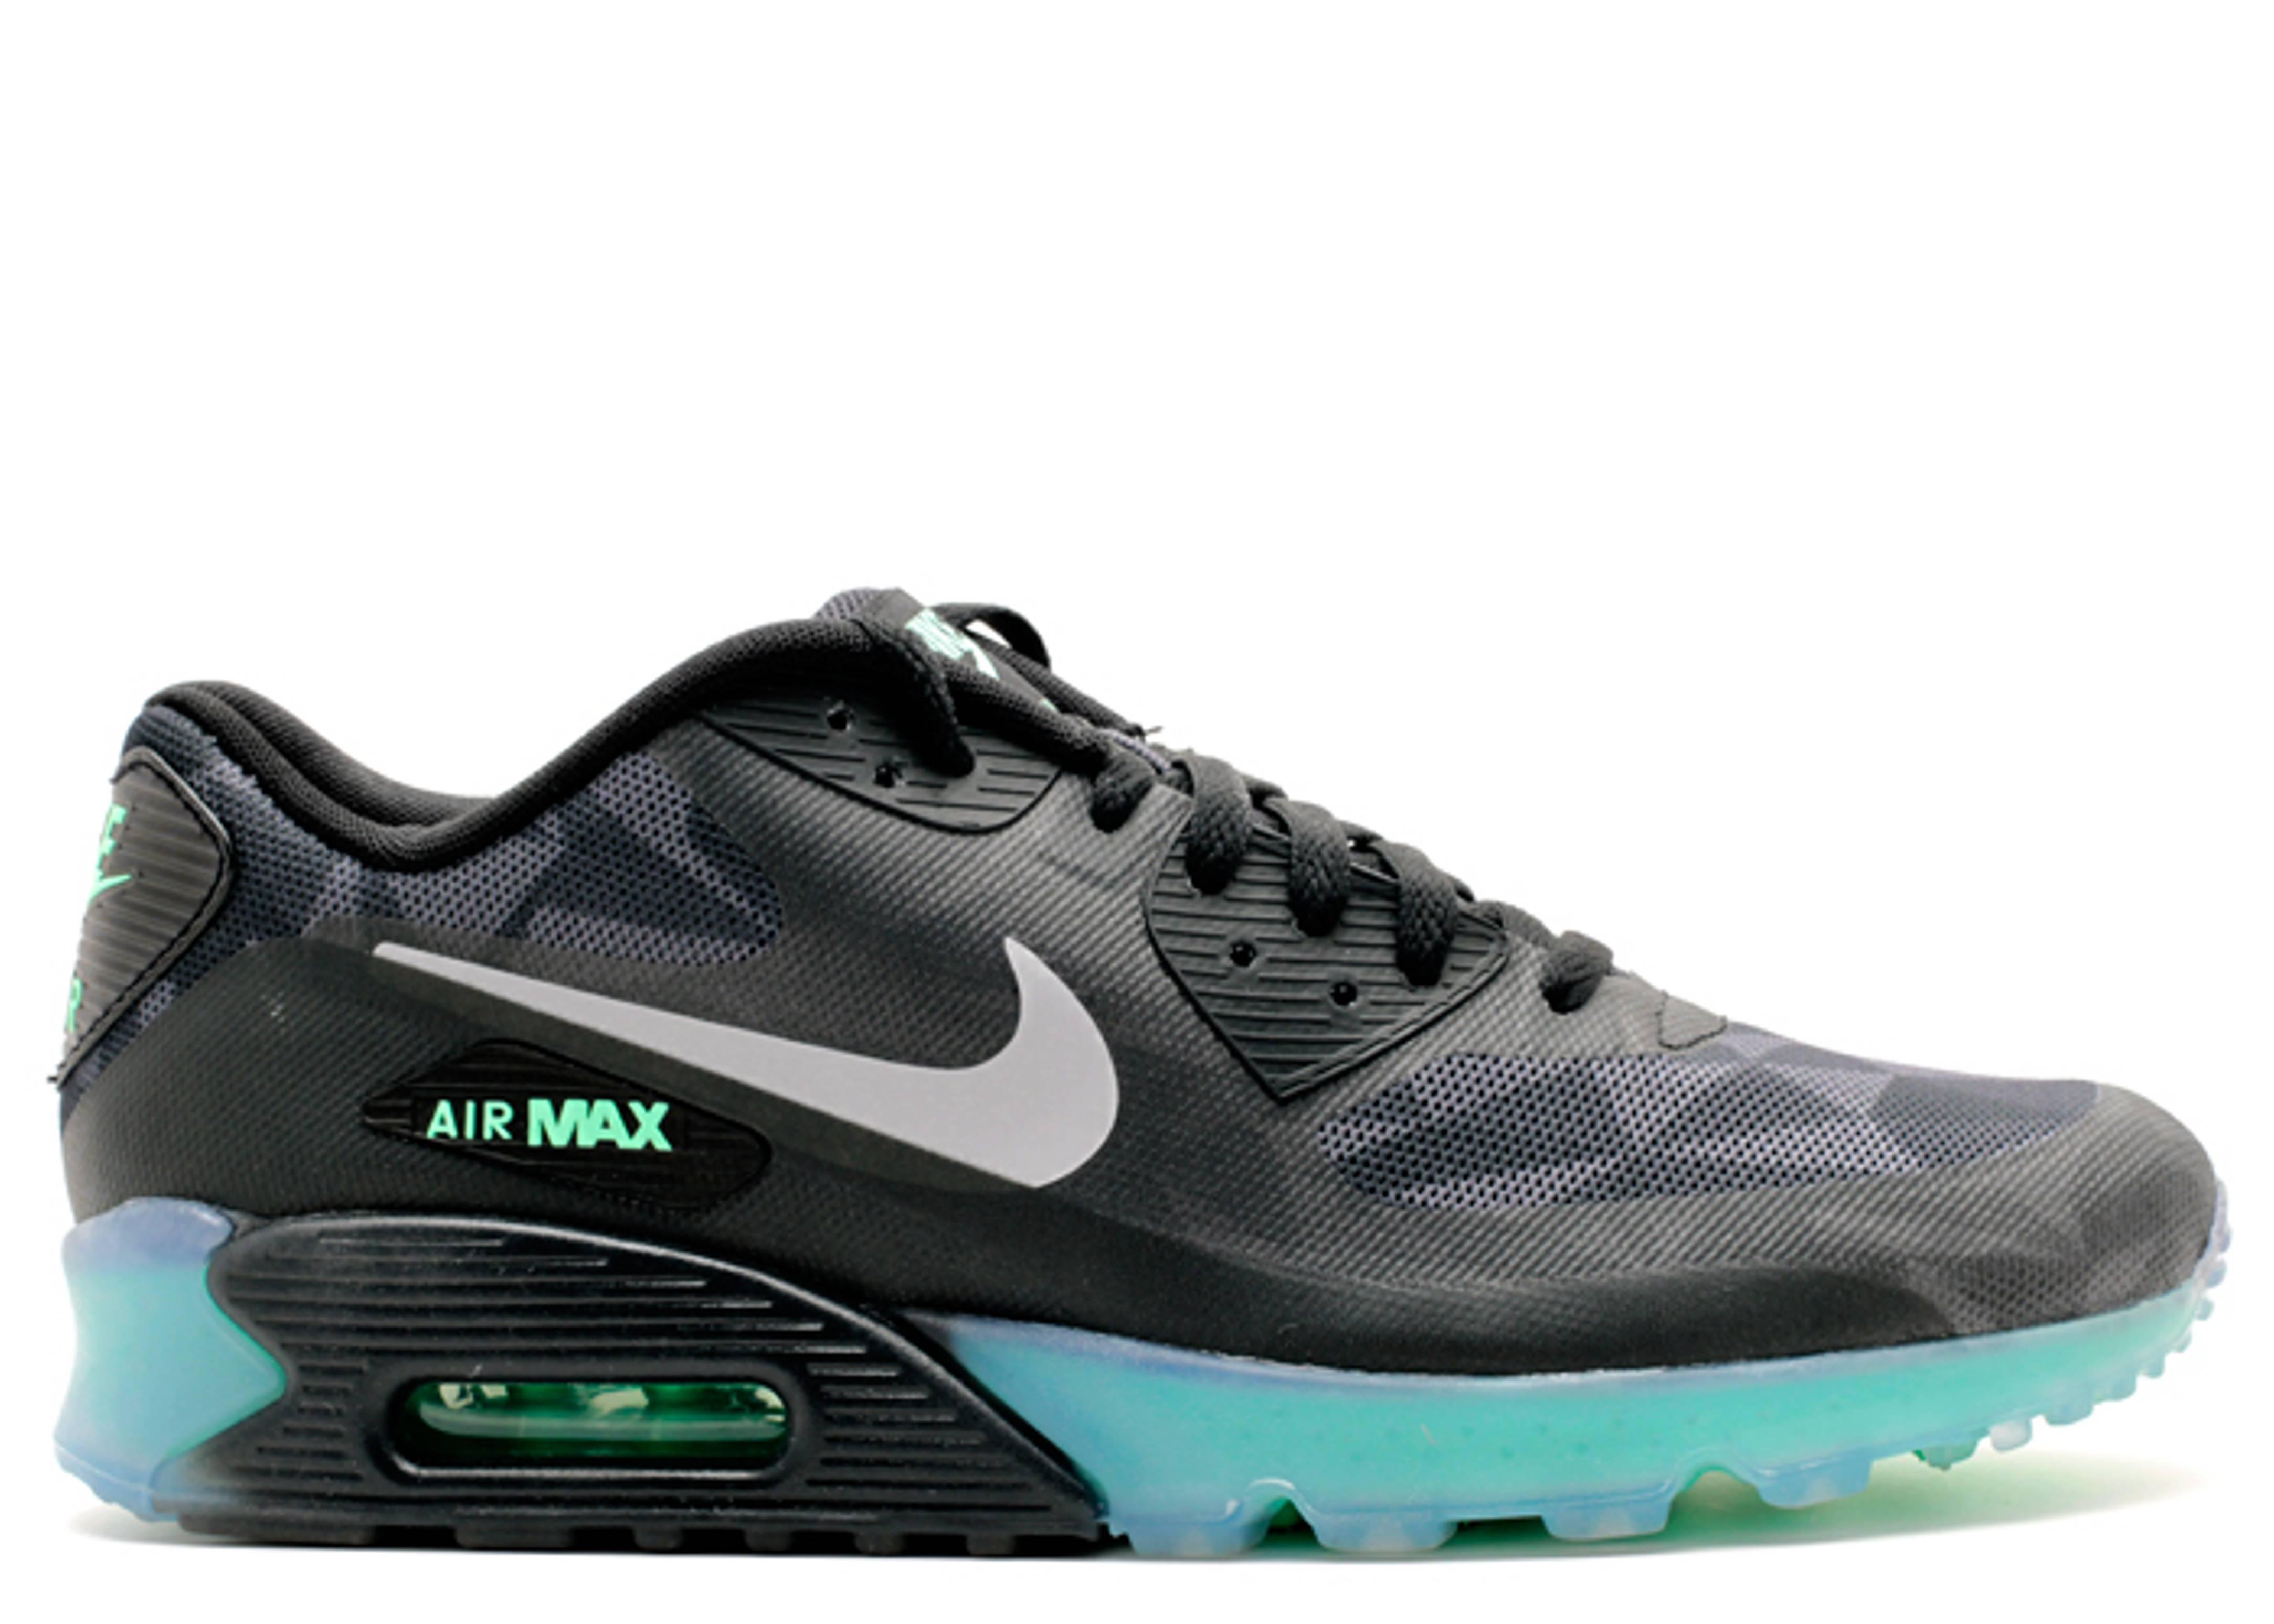 e9c0eaa4f0 Air Max 90 Ice Qs - Nike - 718304 001 - black/cool grey-anthracite-blk |  Flight Club